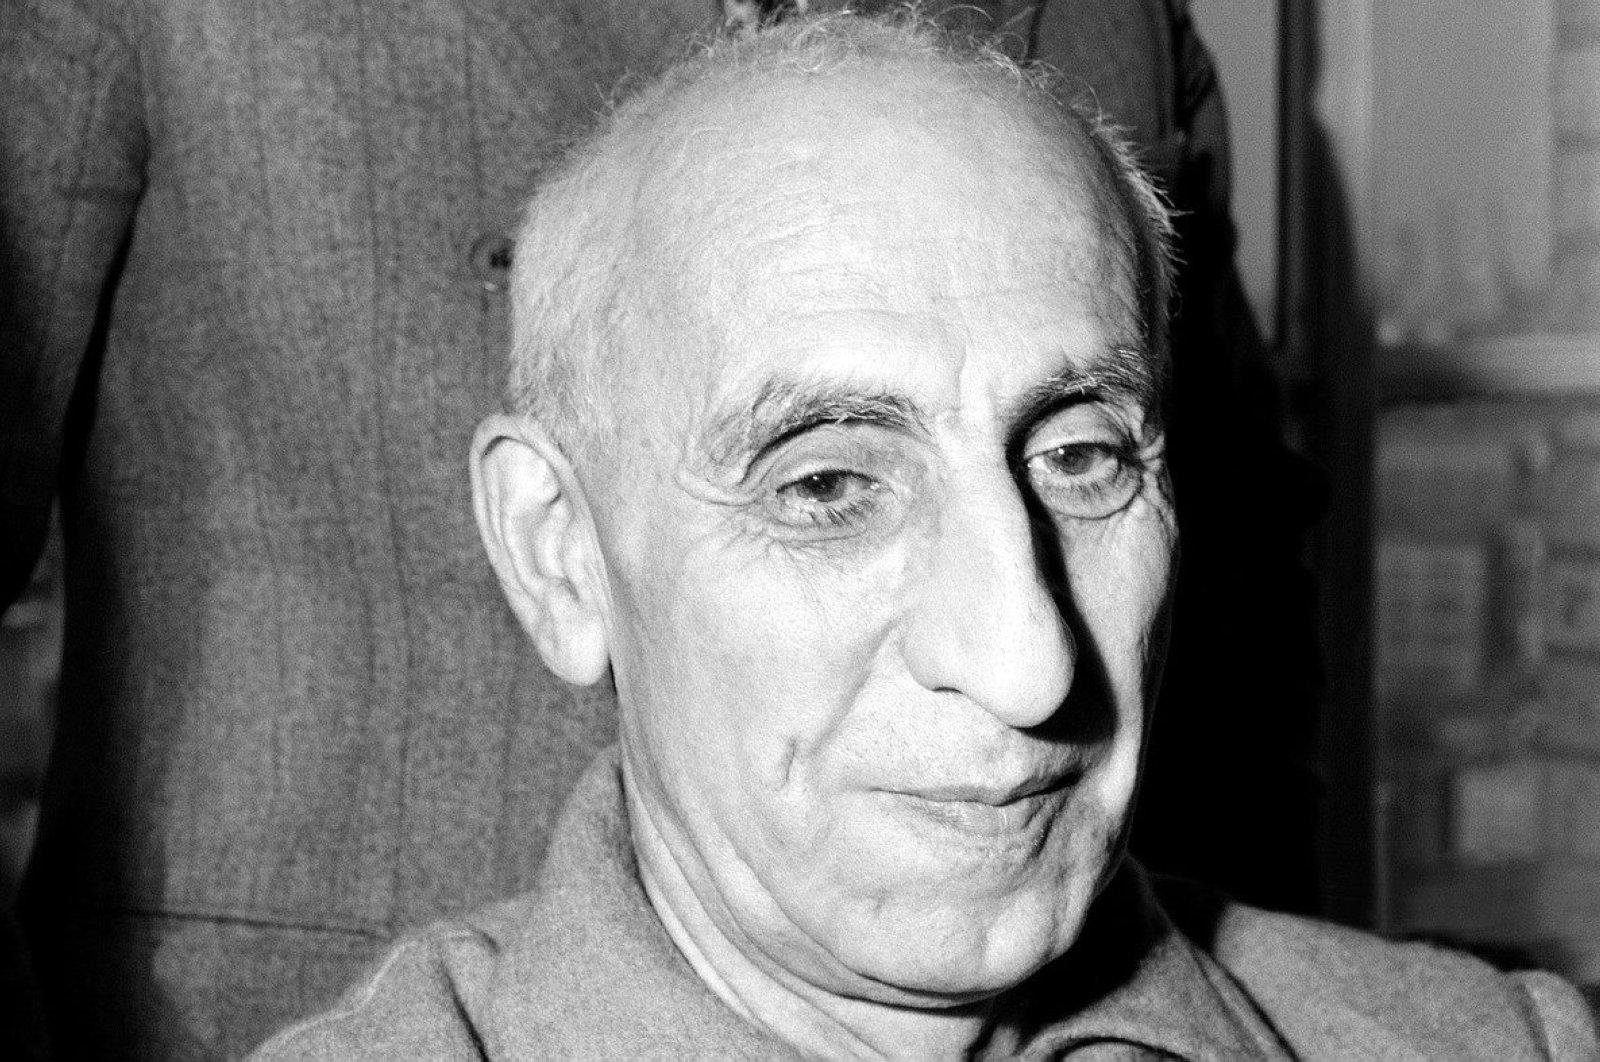 Iranian Prime Minister Mohammed Mossadegh in October 1951. (AP Photo)